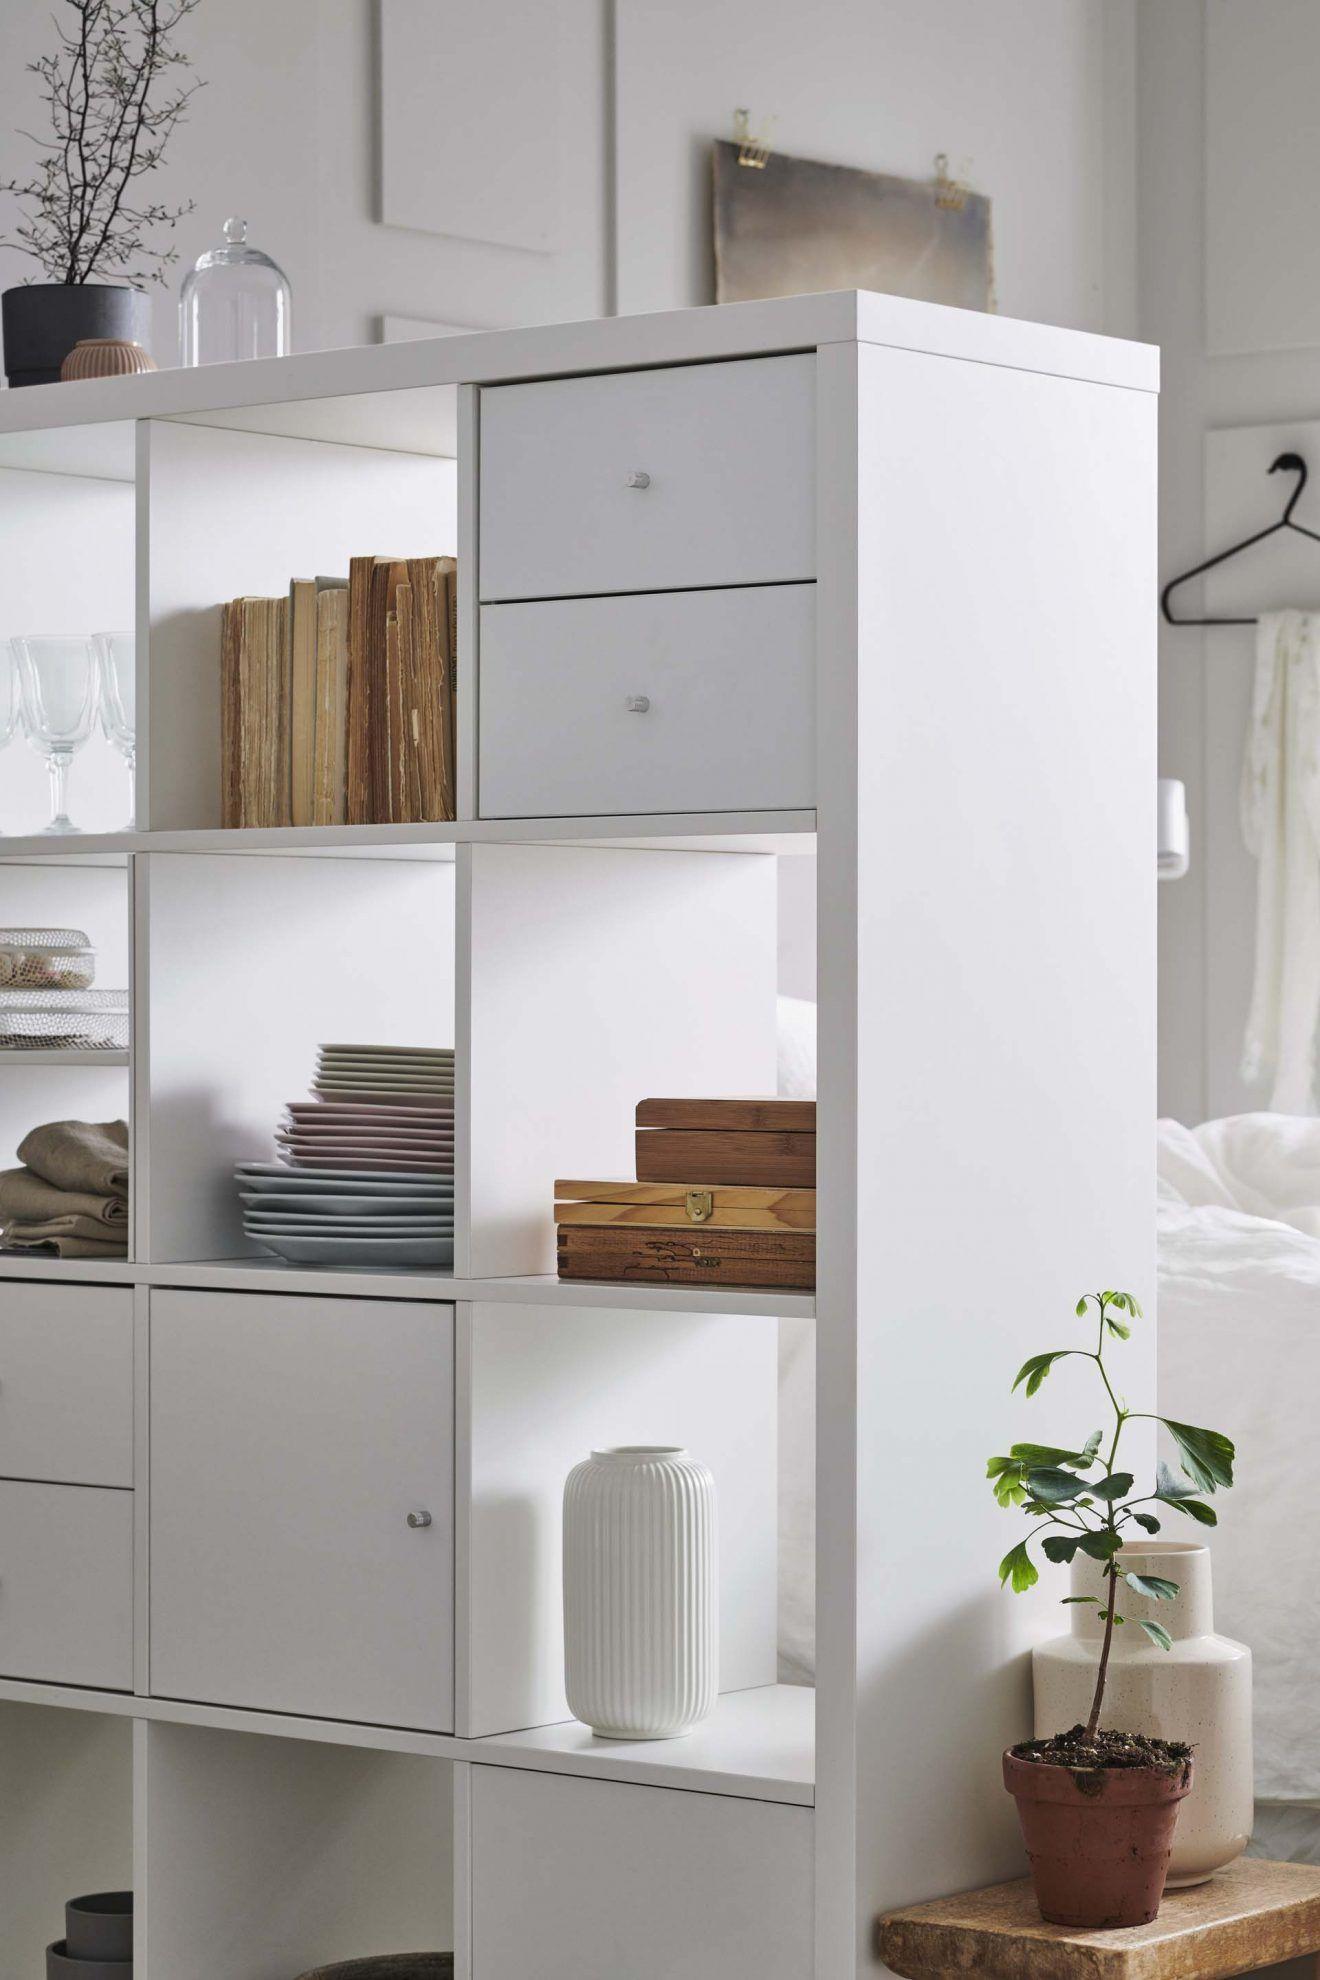 Épinglé sur IKEA. Kalax